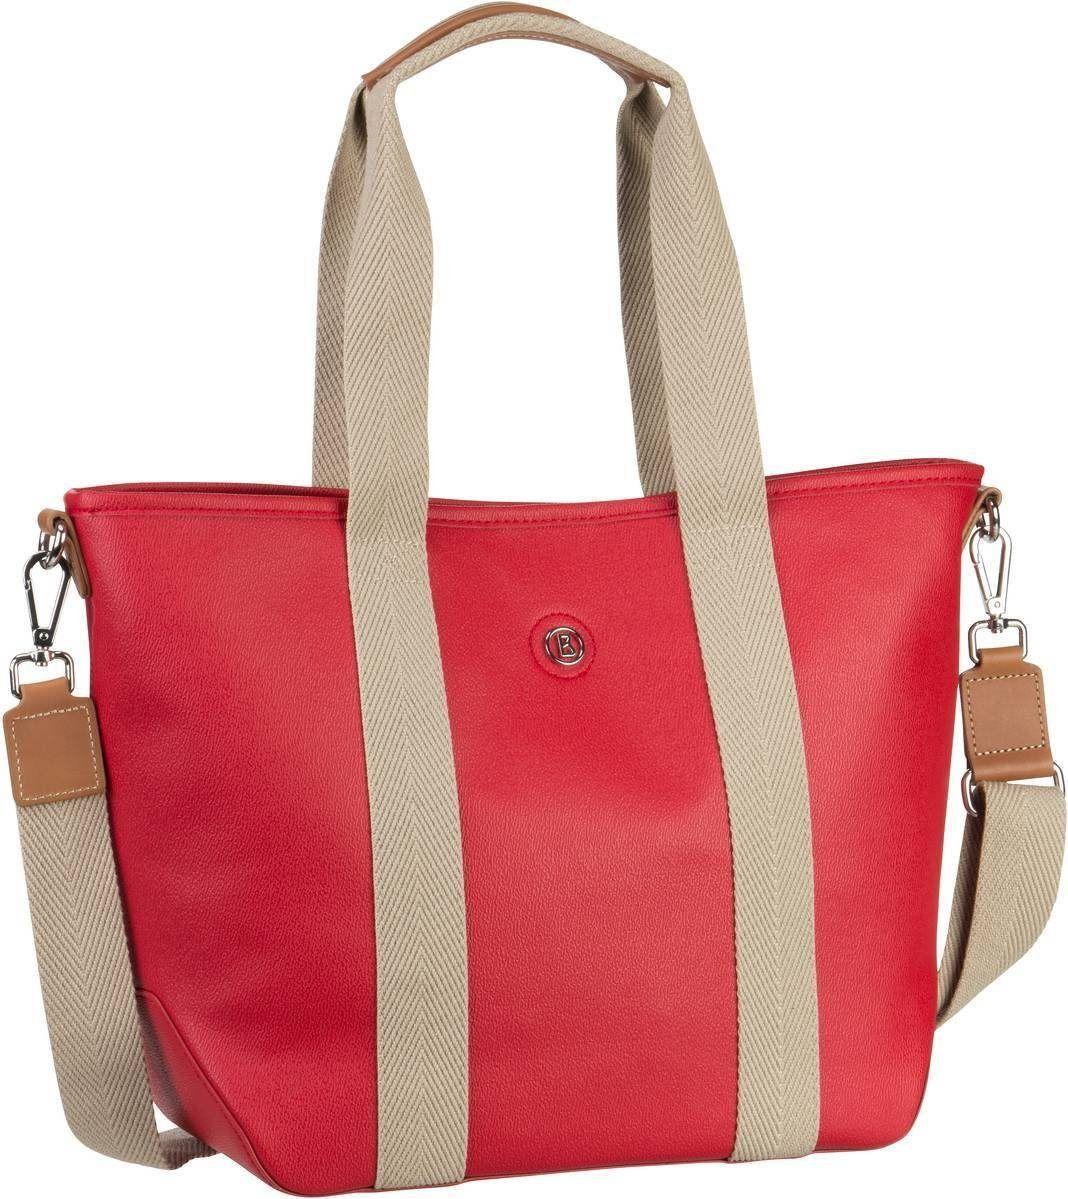 111365f8ecb707 #Accessoires #Bekleidung #Handtaschen #Sale #Damen #Bogner #Handtasche  #Long #Island #Laury #04051531382512 #mode #ootd #outfit #fashion #style  #online